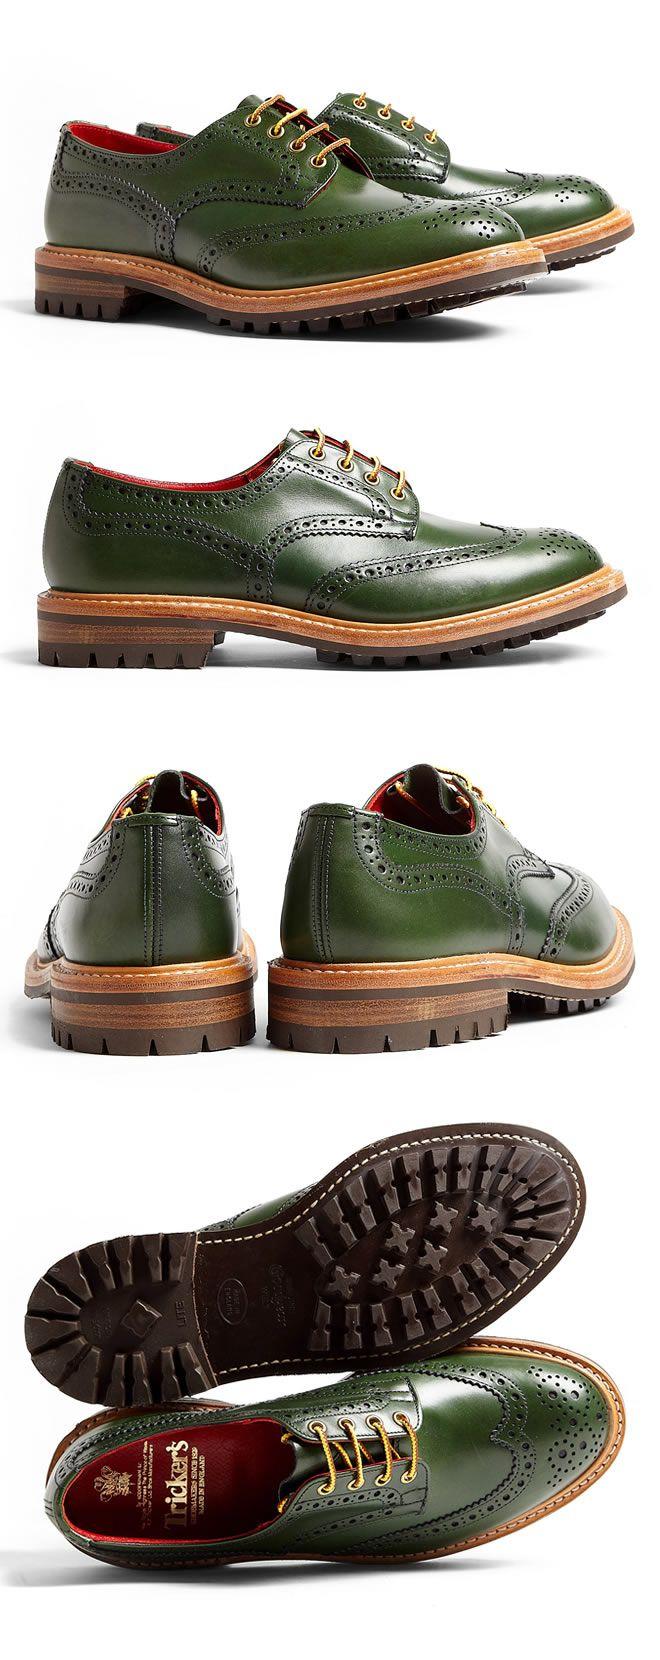 ♂ Masculine & elegance, man's accessories Tricker's Green Commando Brogu...